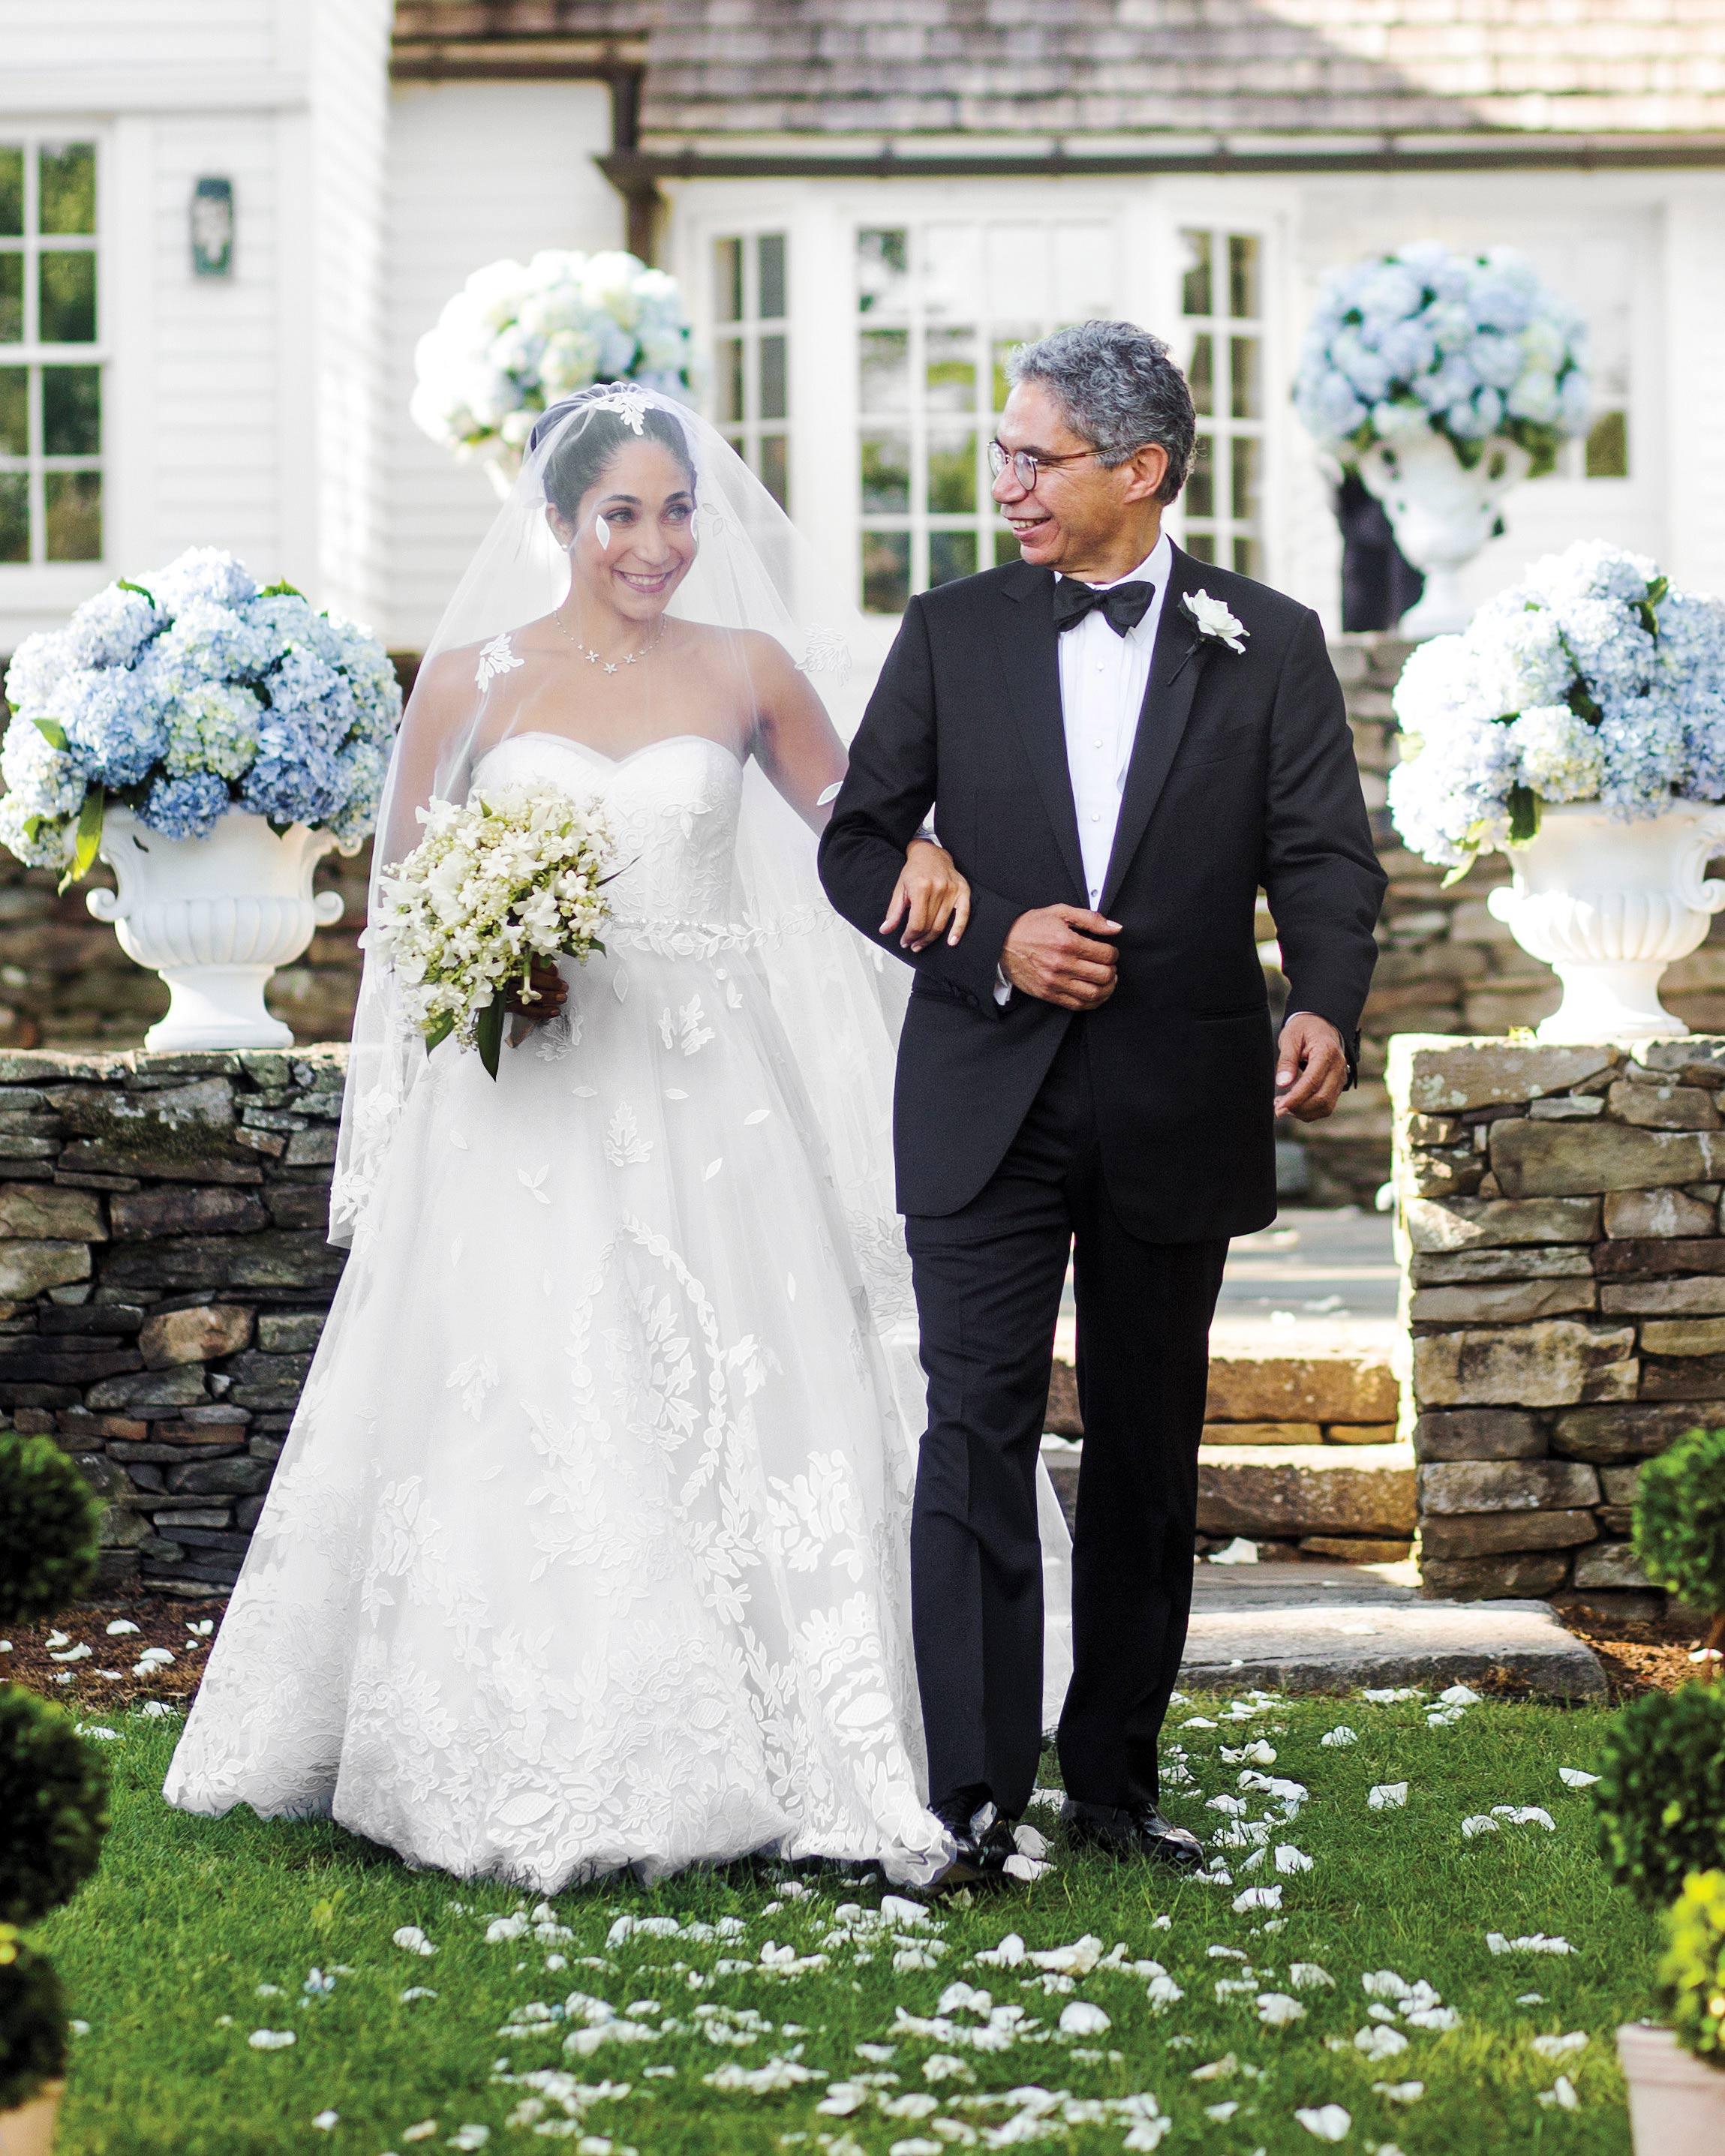 mhonor-jay-wedding-connecticut-walking-down-aisle-0820-d112238.jpg